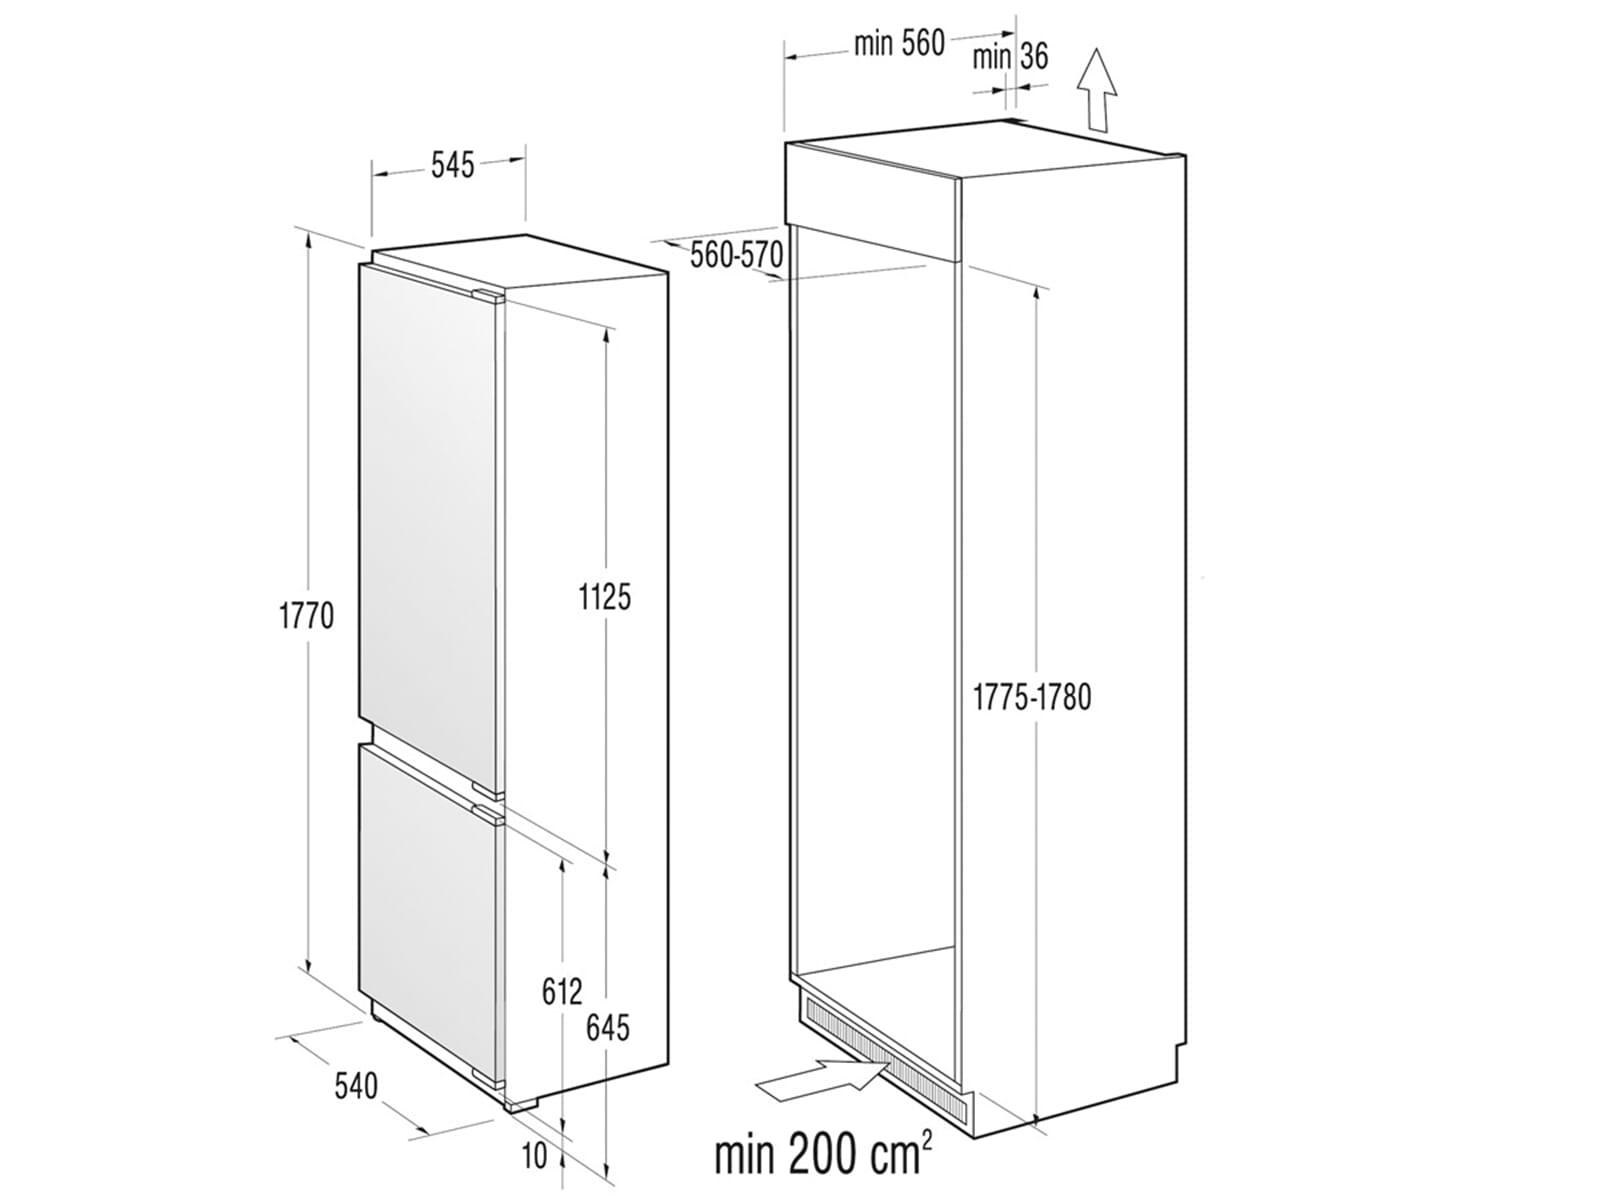 gorenje rki 5181 aw einbau k hl gefrierkombination. Black Bedroom Furniture Sets. Home Design Ideas